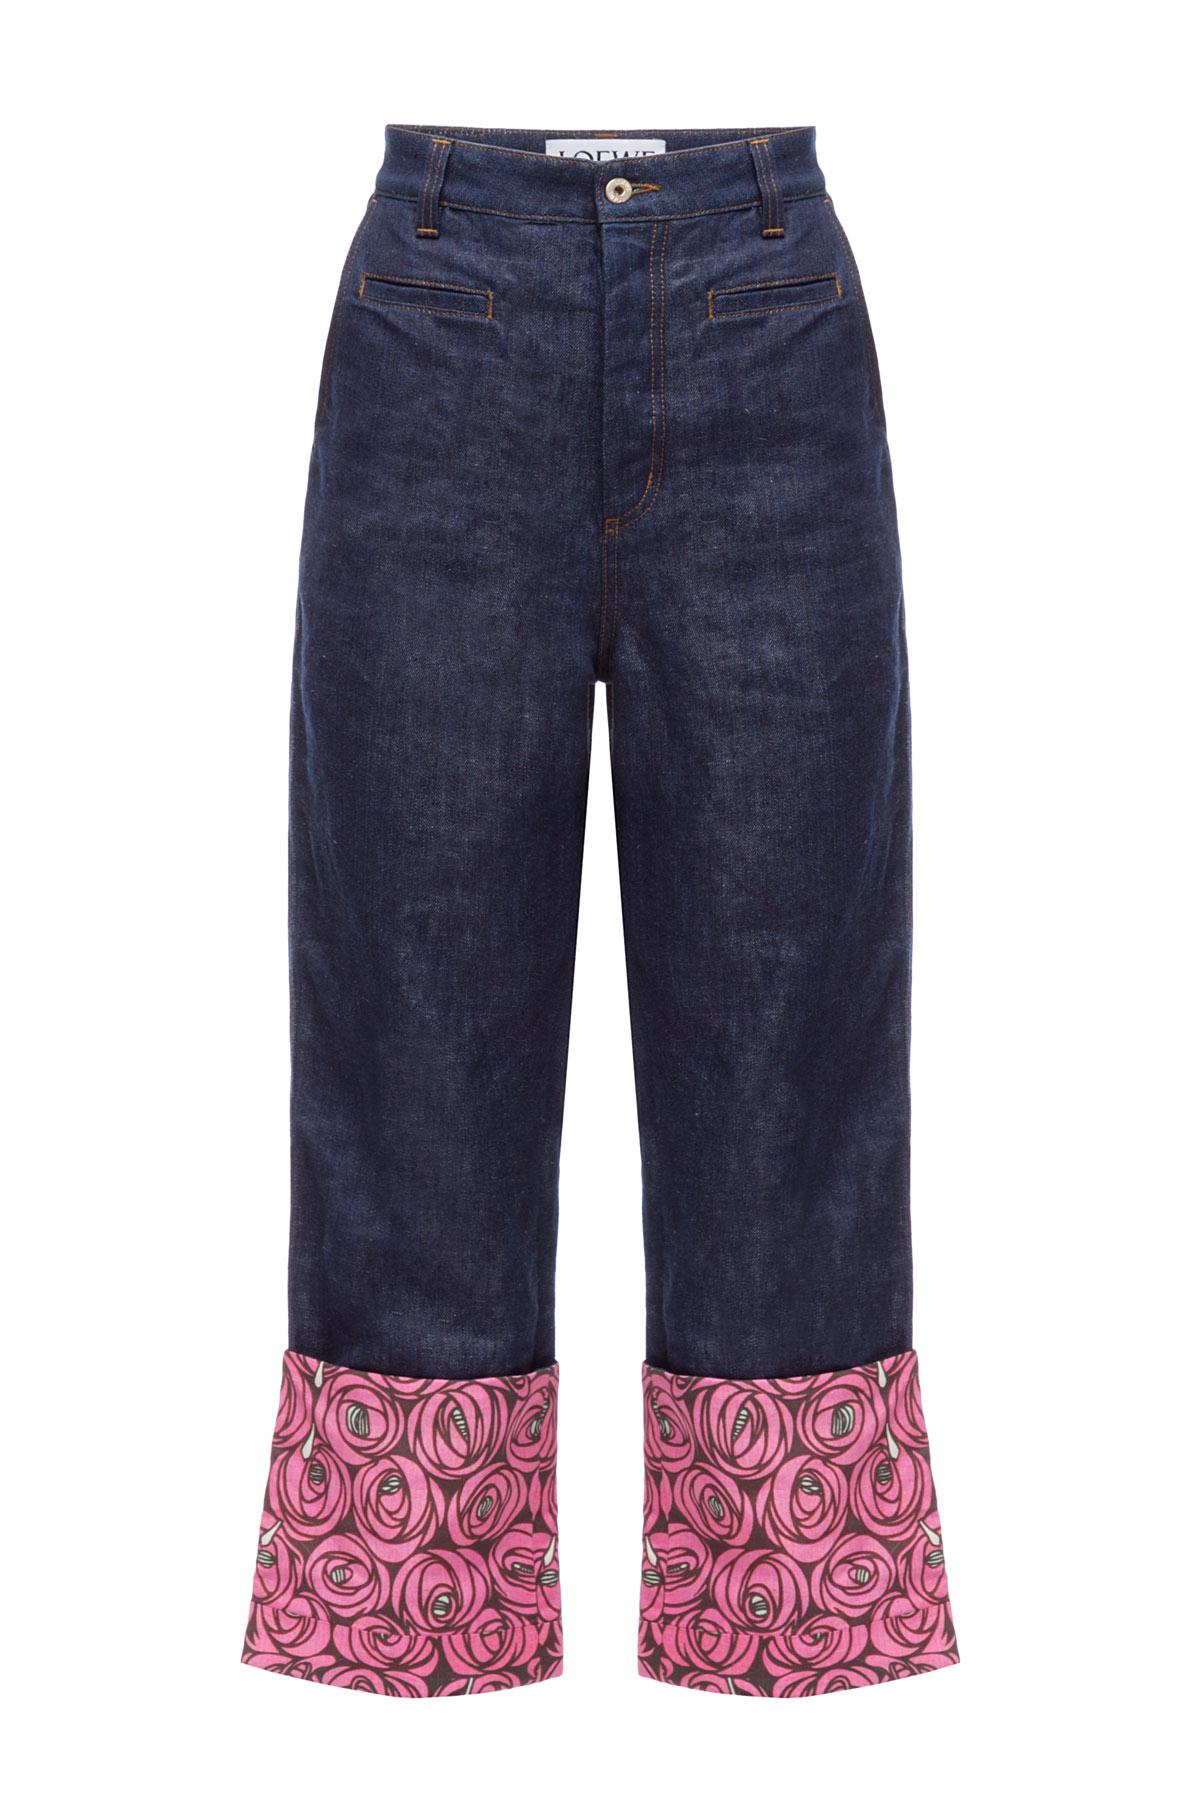 LOEWE Fisherman Trousers Roses indigo/multicolour front